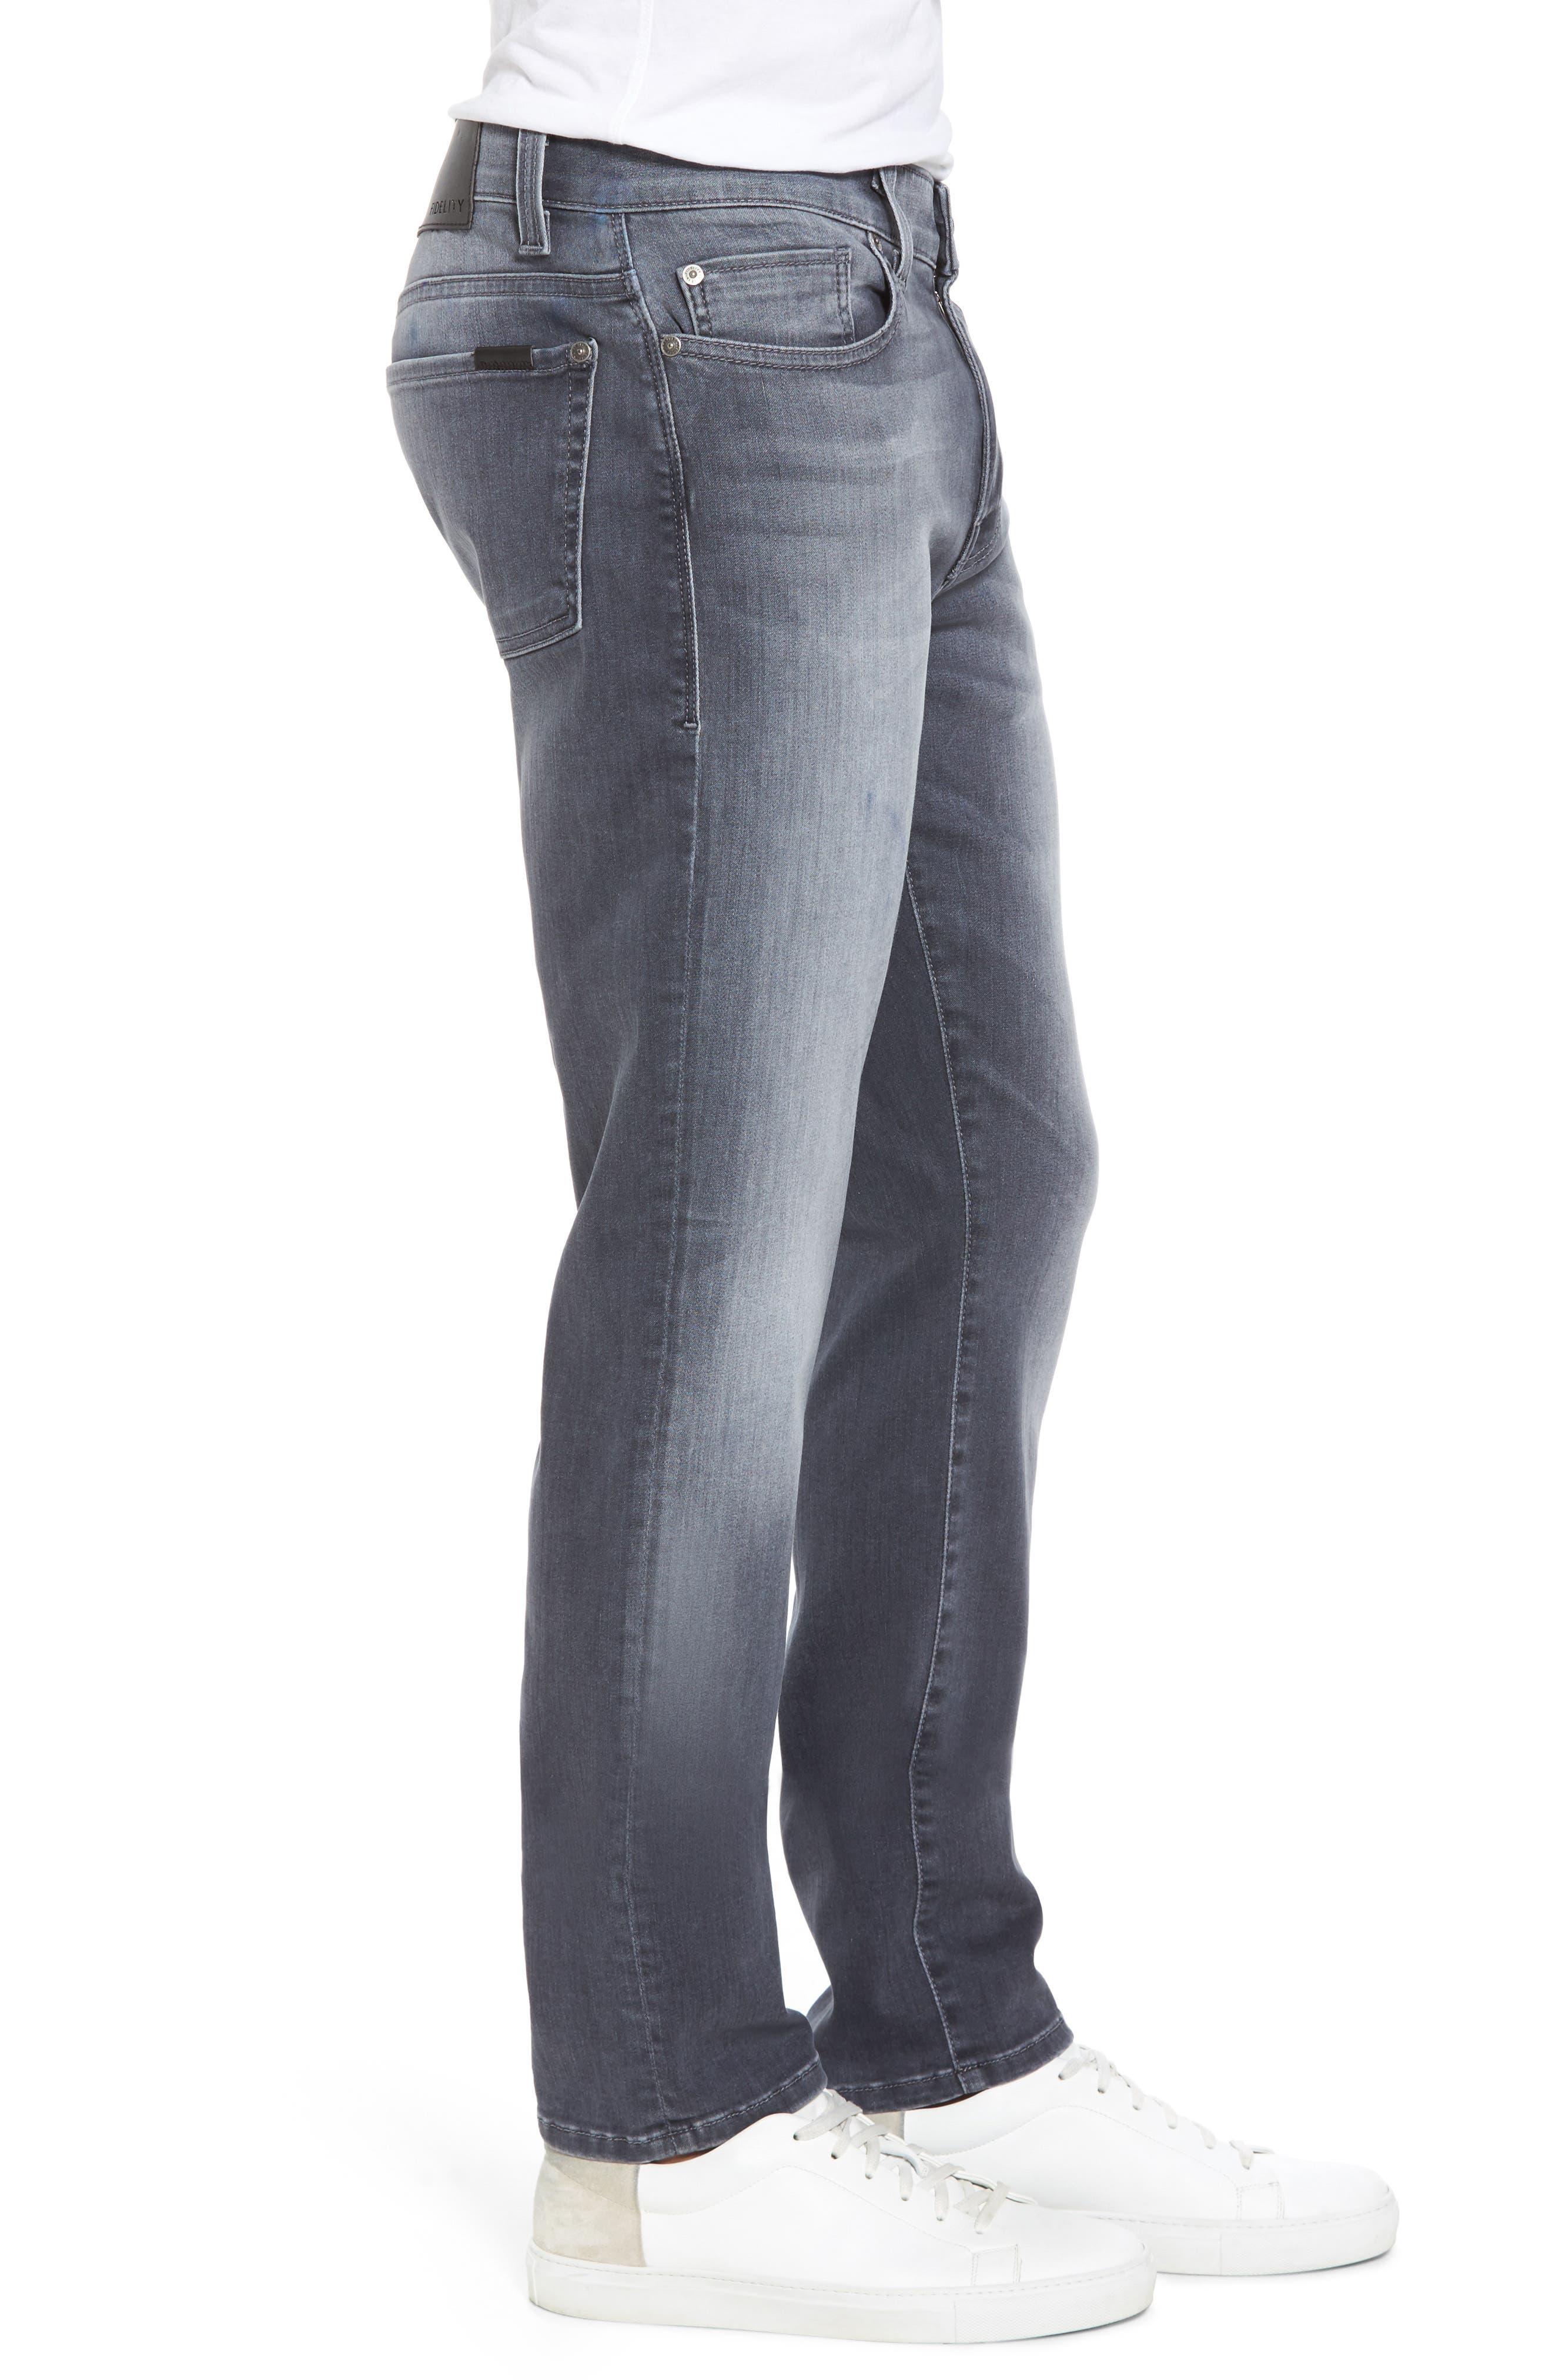 Torino Slim Fit Jeans,                             Alternate thumbnail 3, color,                             020